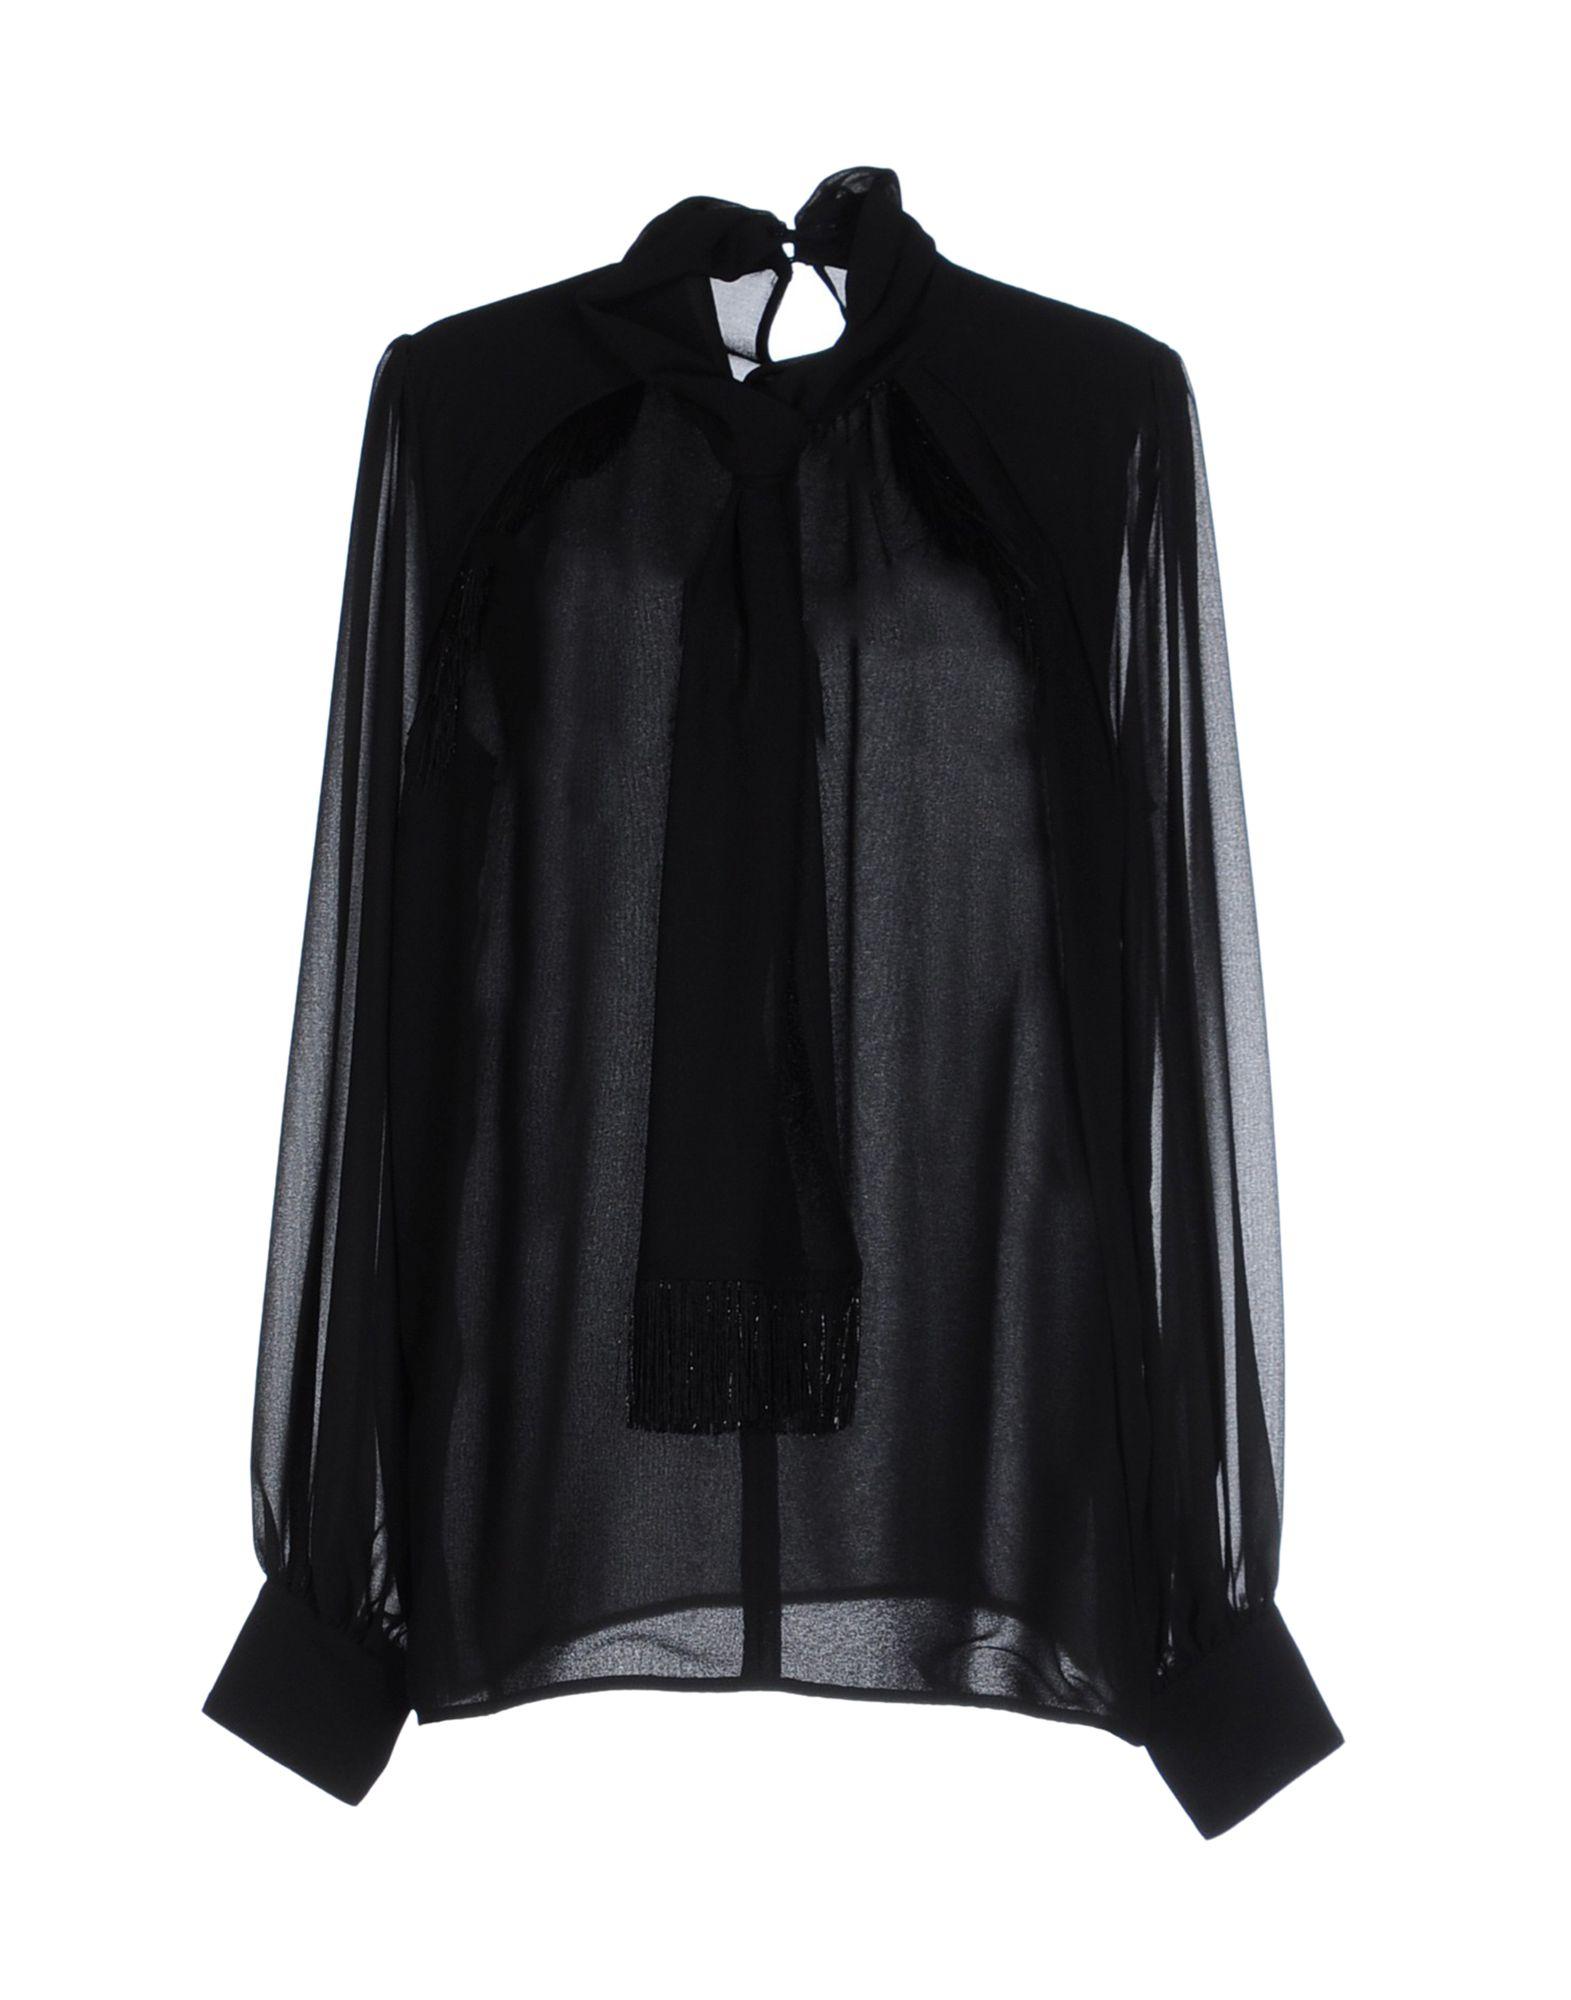 ATOS LOMBARDINI Damen Bluse Farbe Schwarz Größe 5